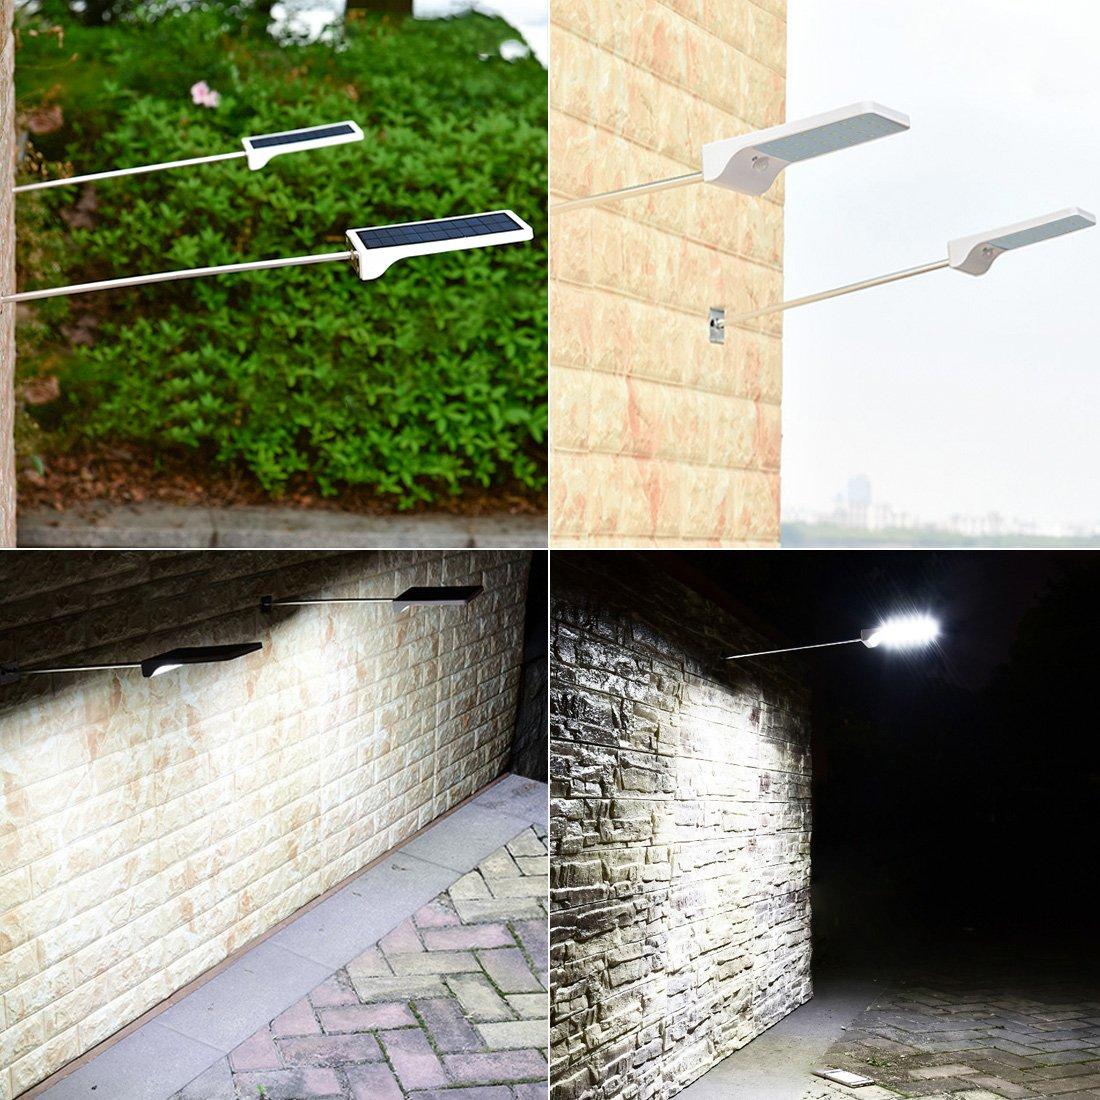 1pack LEDMO Luces sensor solares LED,36 leds foco solar sensor led,IP65 Impermeable luz led exterior pared Luz de sensor de movimiento inal/ámbrico para Jardin,Patio,Camino